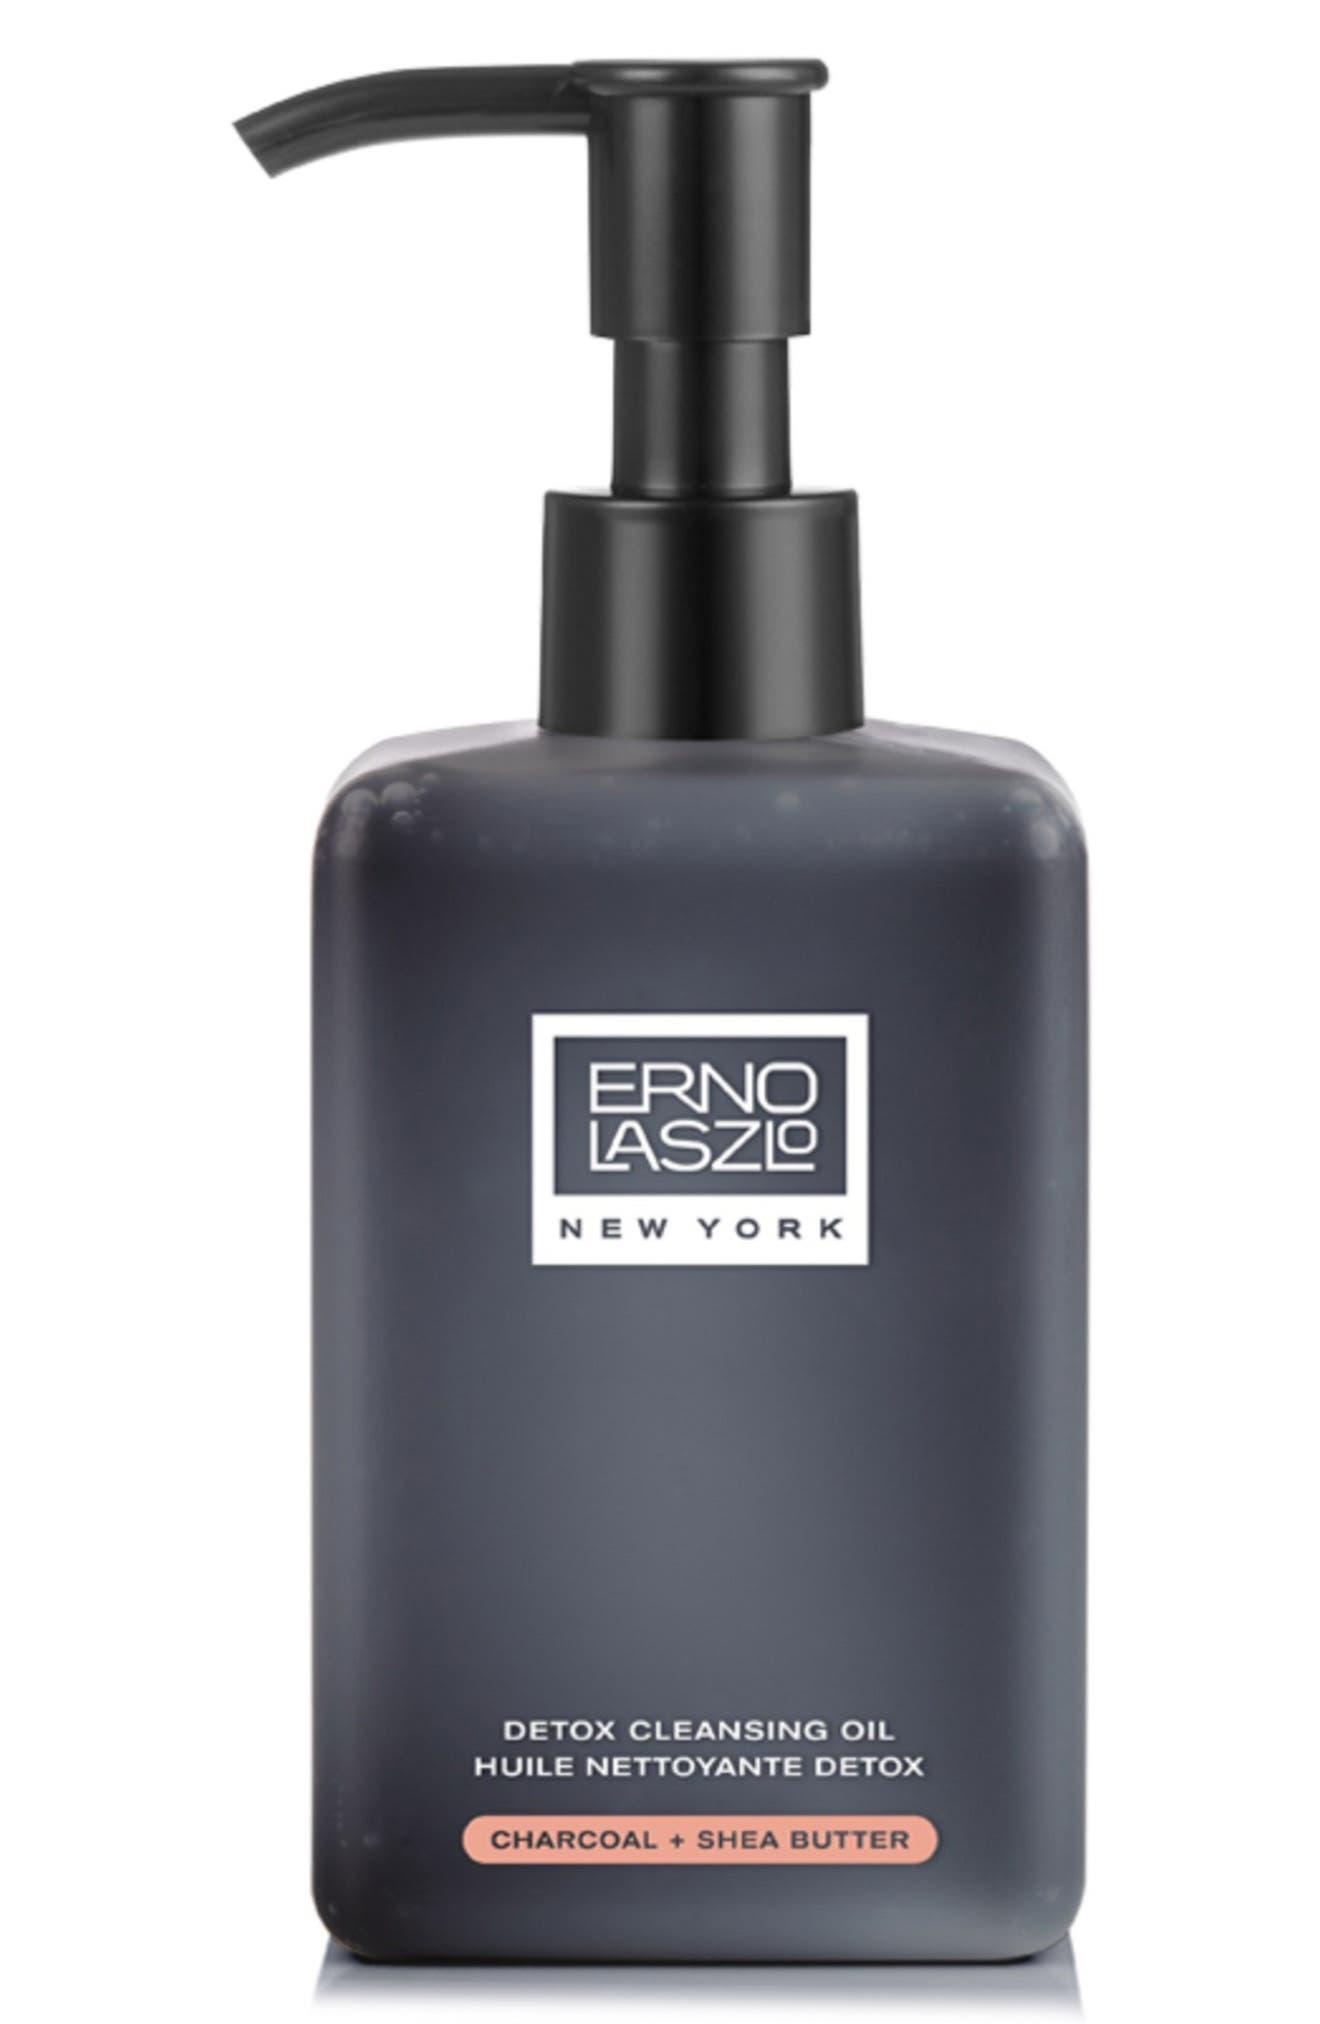 Erno Laszlo Detox Cleansing Oil